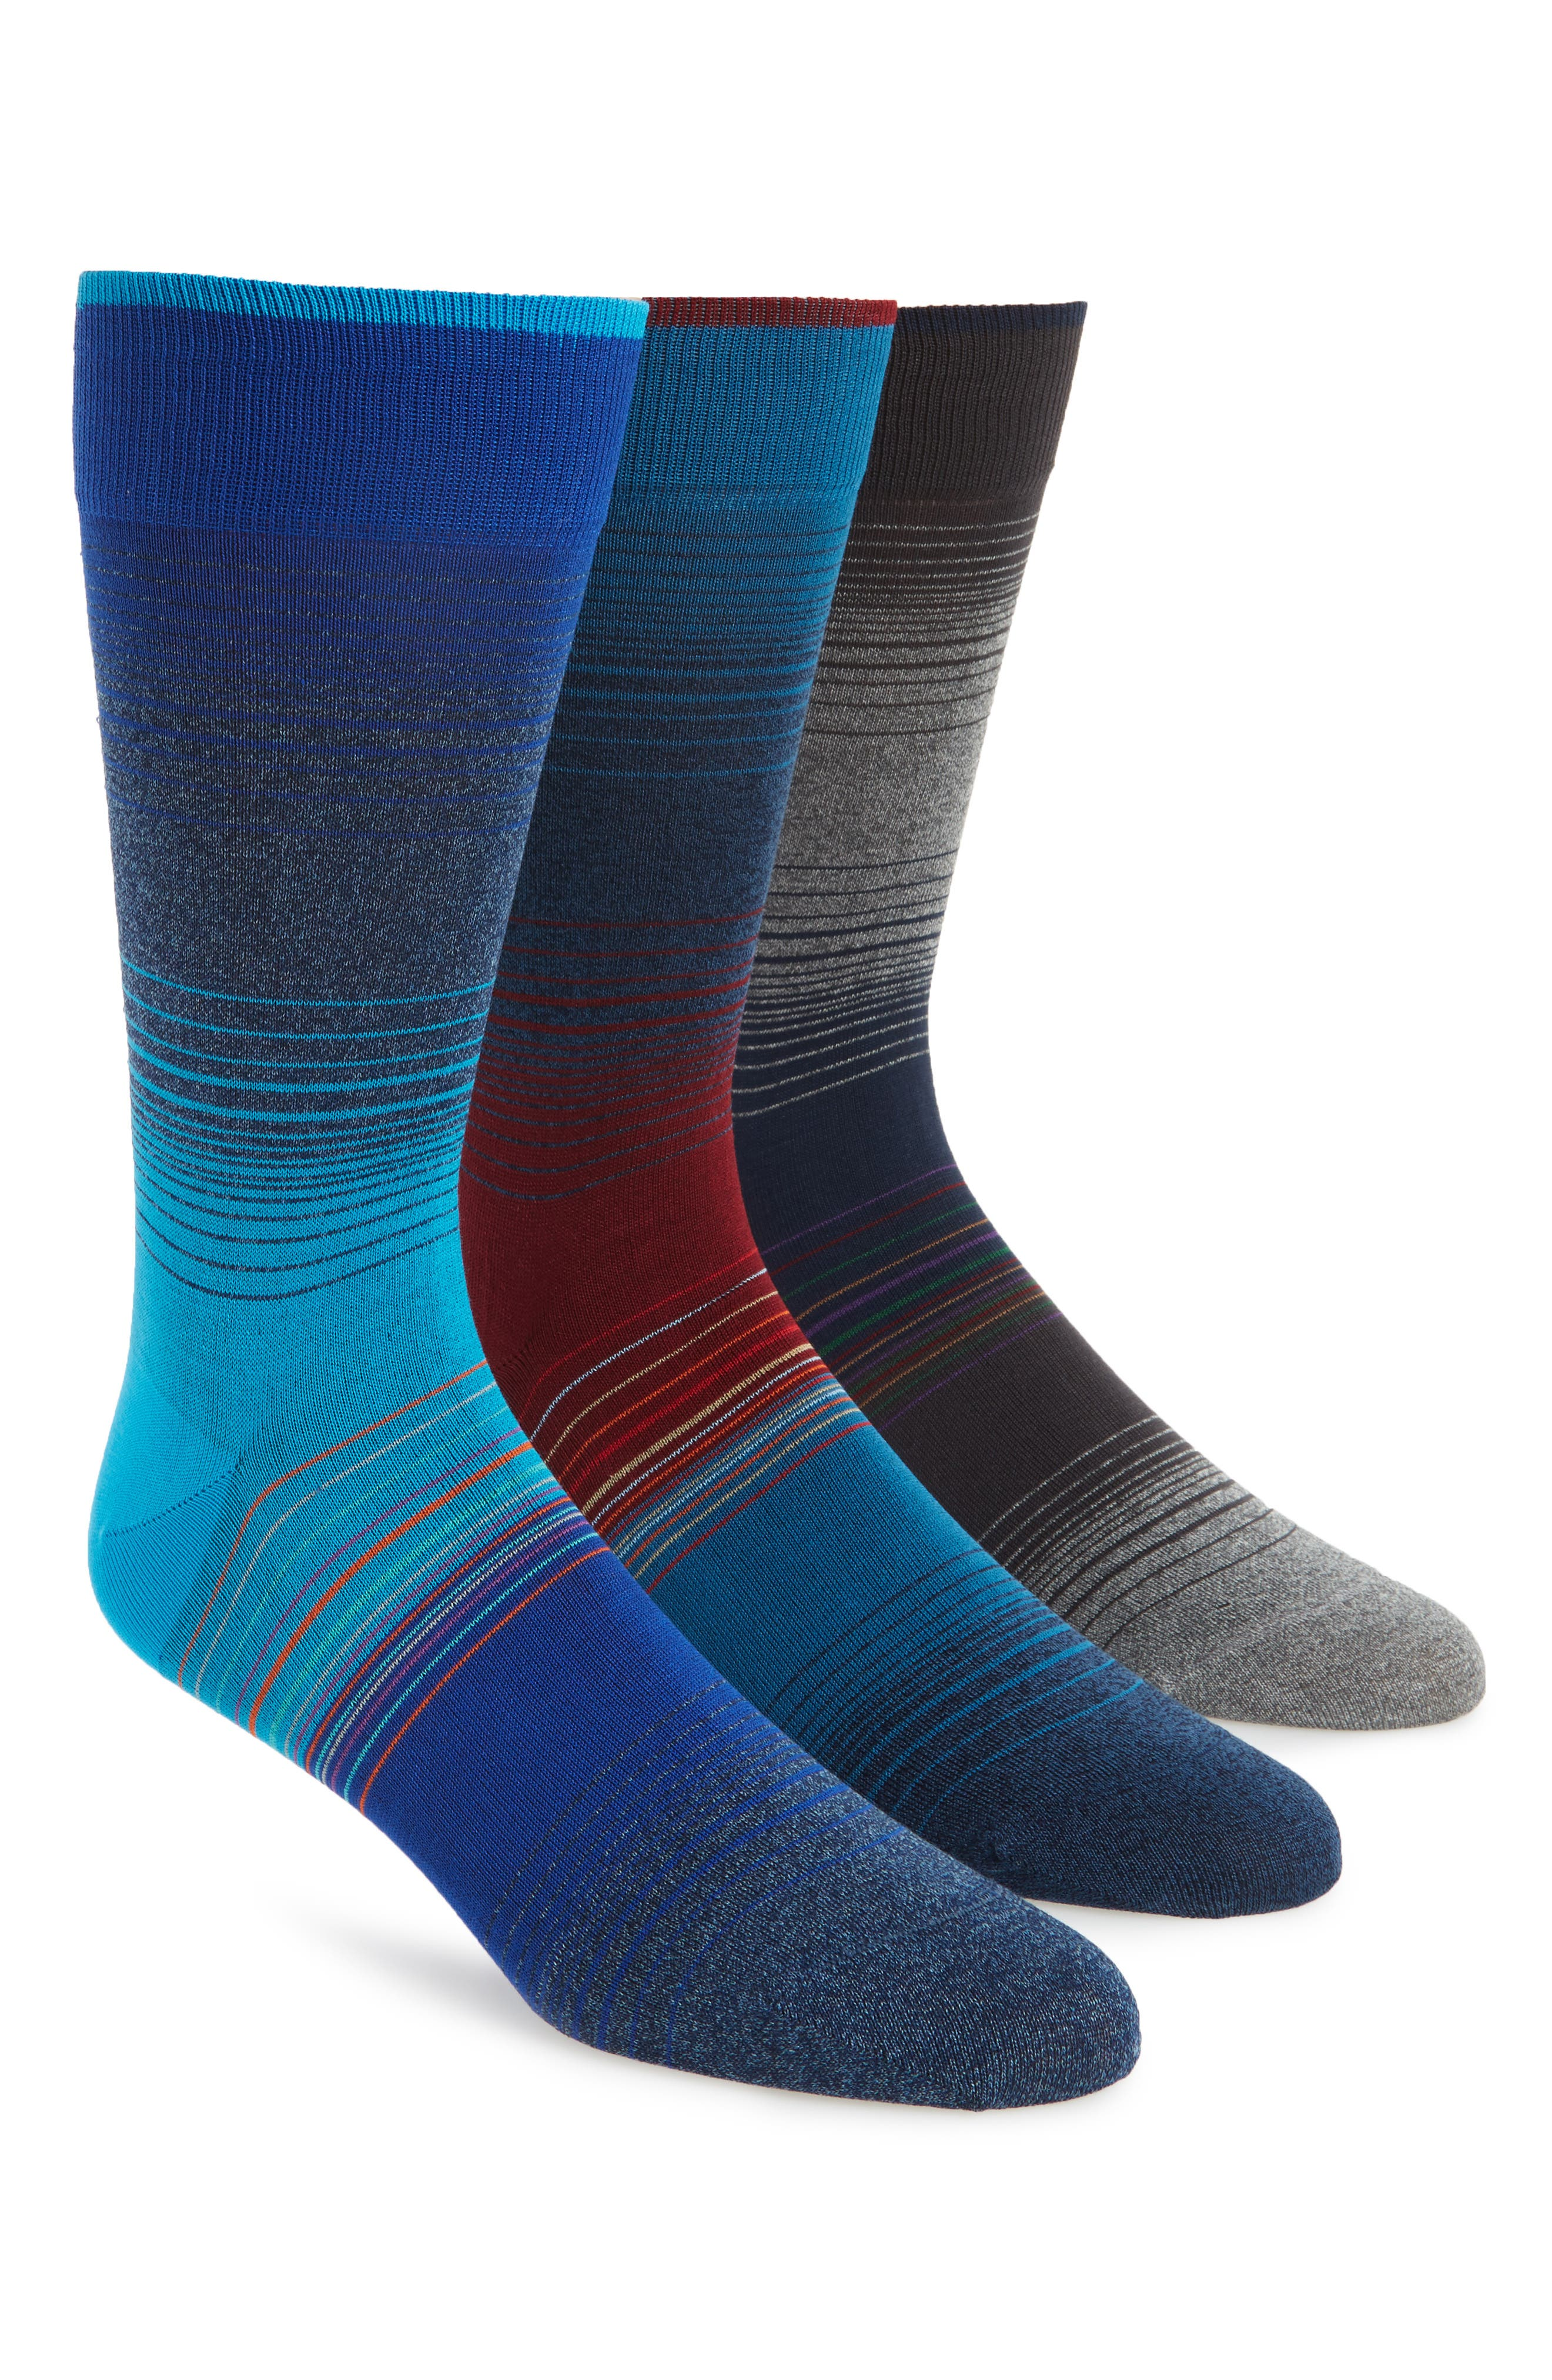 Main Image - Bugatchi 3-Pack Stripe Cotton & Cashmere Blend Socks ($59.85 Value)